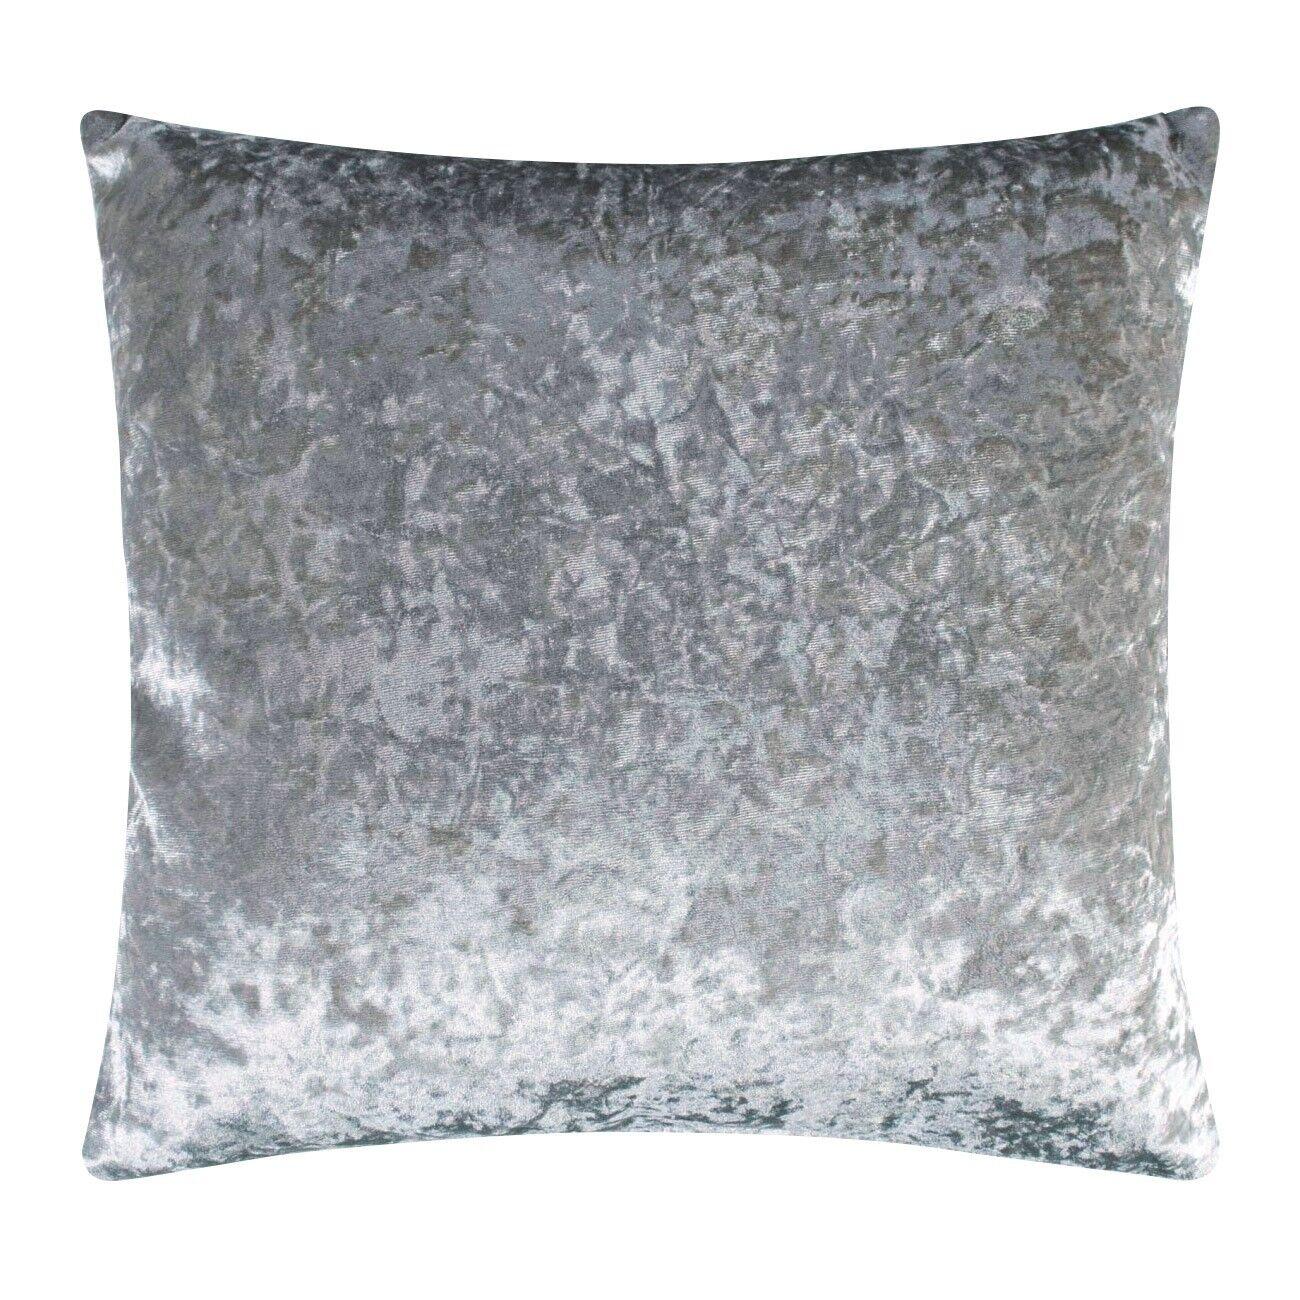 Luxus Cuscini.Cuscini Luxus Crushed Samt Kissen In Silber 17 X 17 43cm X